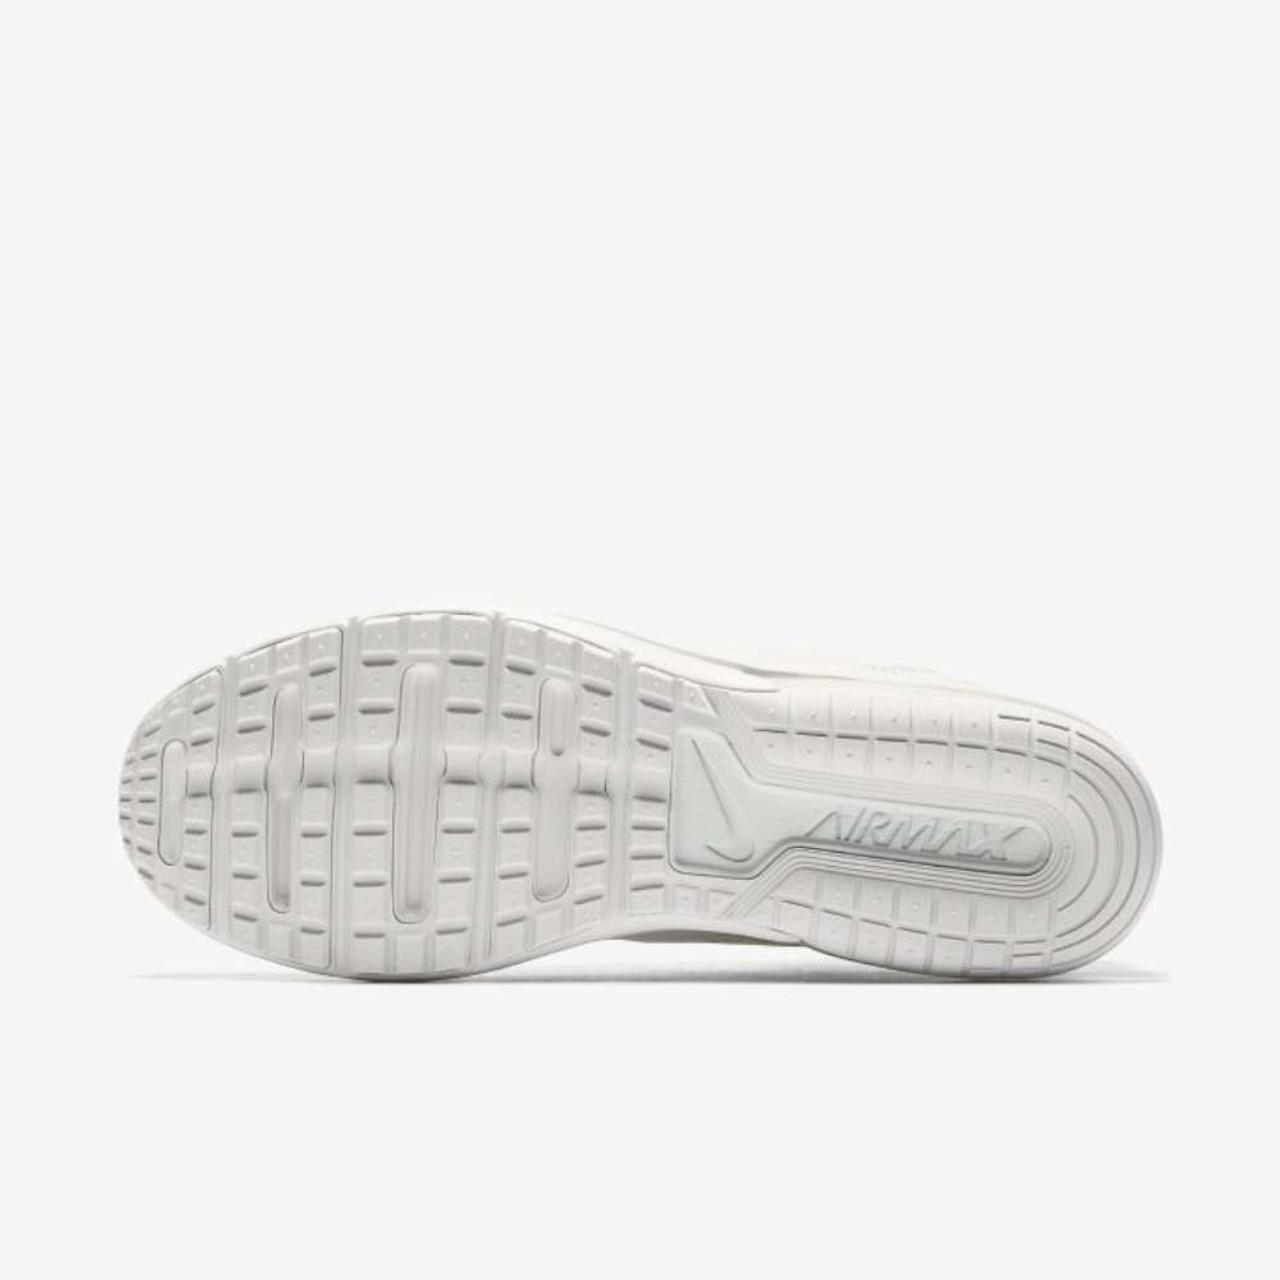 1189a8fbc9f62 Nike Mens Nike Air Max Fury Fabric Low Top Lace Up Running  Sneaker~pp-e8ca8384